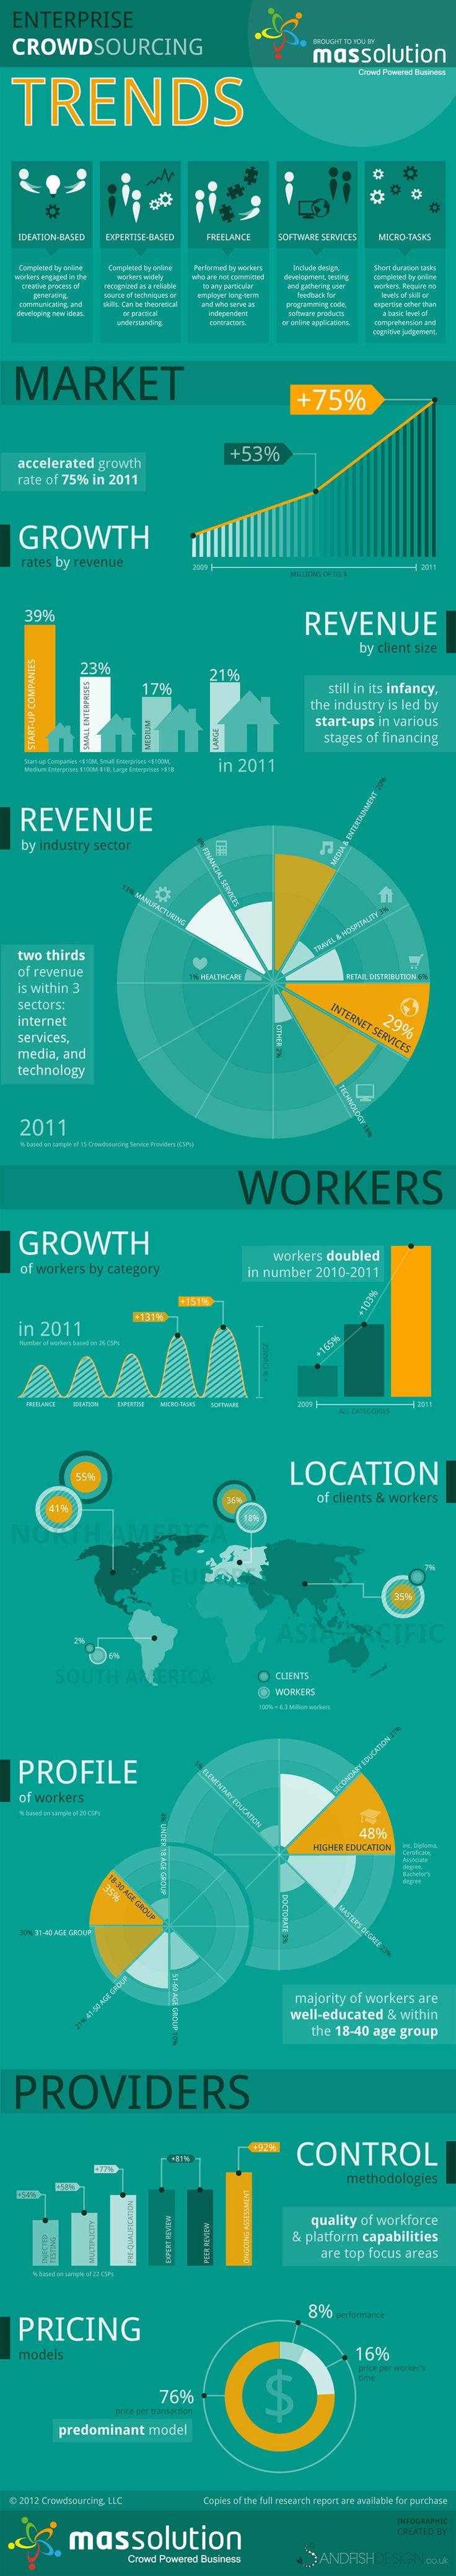 Enterprise Crowdsourcing Trends [Infographic]